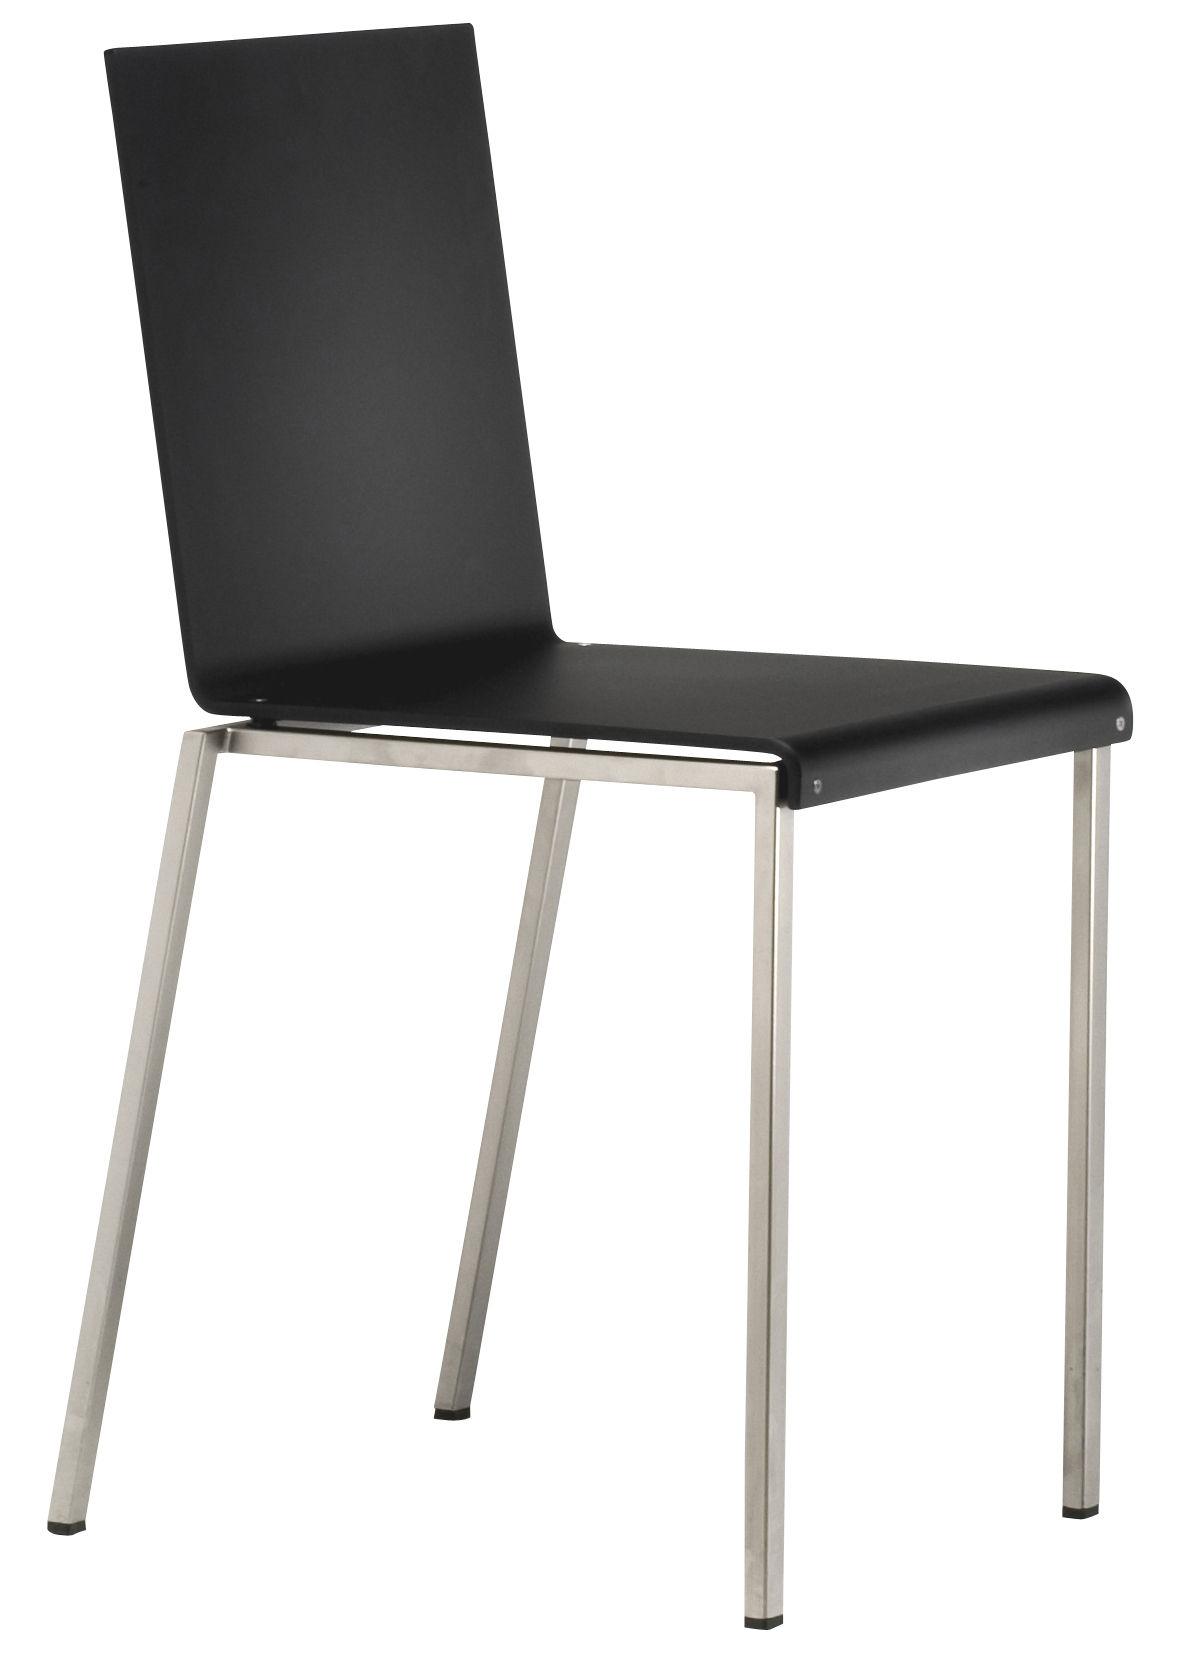 Möbel - Stühle  - Bianca Stuhl - Zeus - Schwarz - Acrylharz, mattierter Stahl